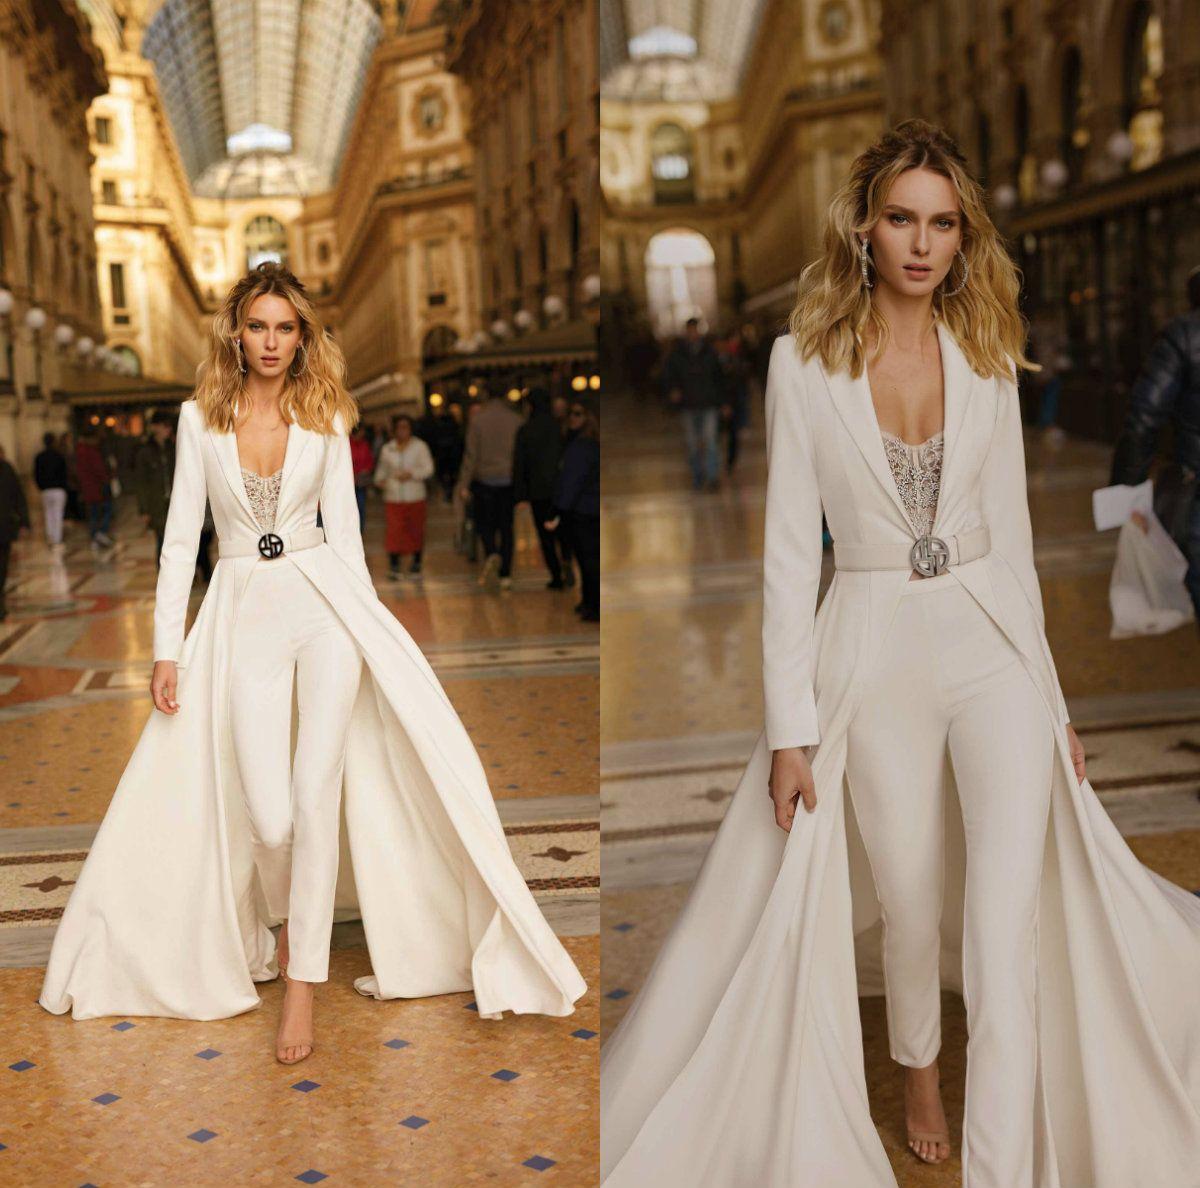 2020 Berta Wedding Jumpsuits Lace Beads Overskirts A Line Beach Wedding Dress Sweep Train Long Sleeves Satin Boho Vestidos De Novia